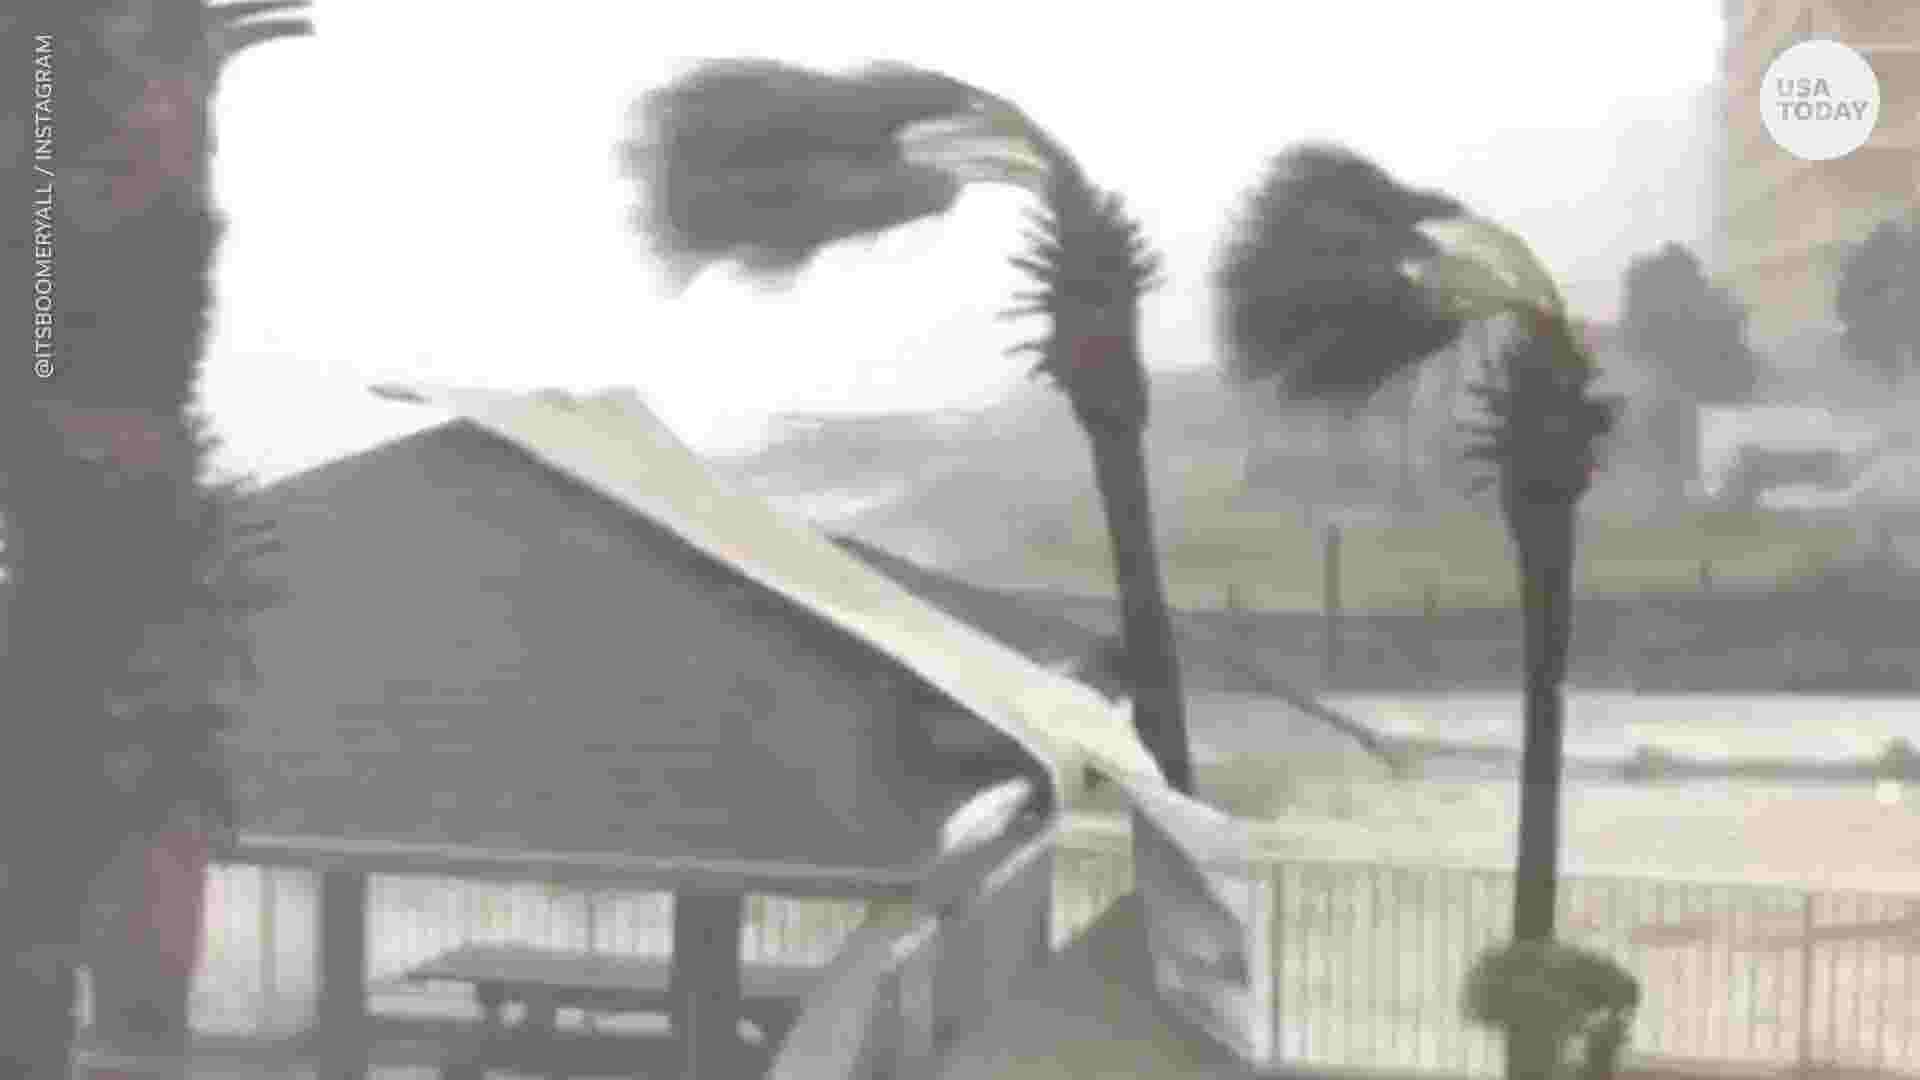 Hurricane Michael Aftermath See Dramatic Photos Of Panama City Damage - Panama city beach car show 2018